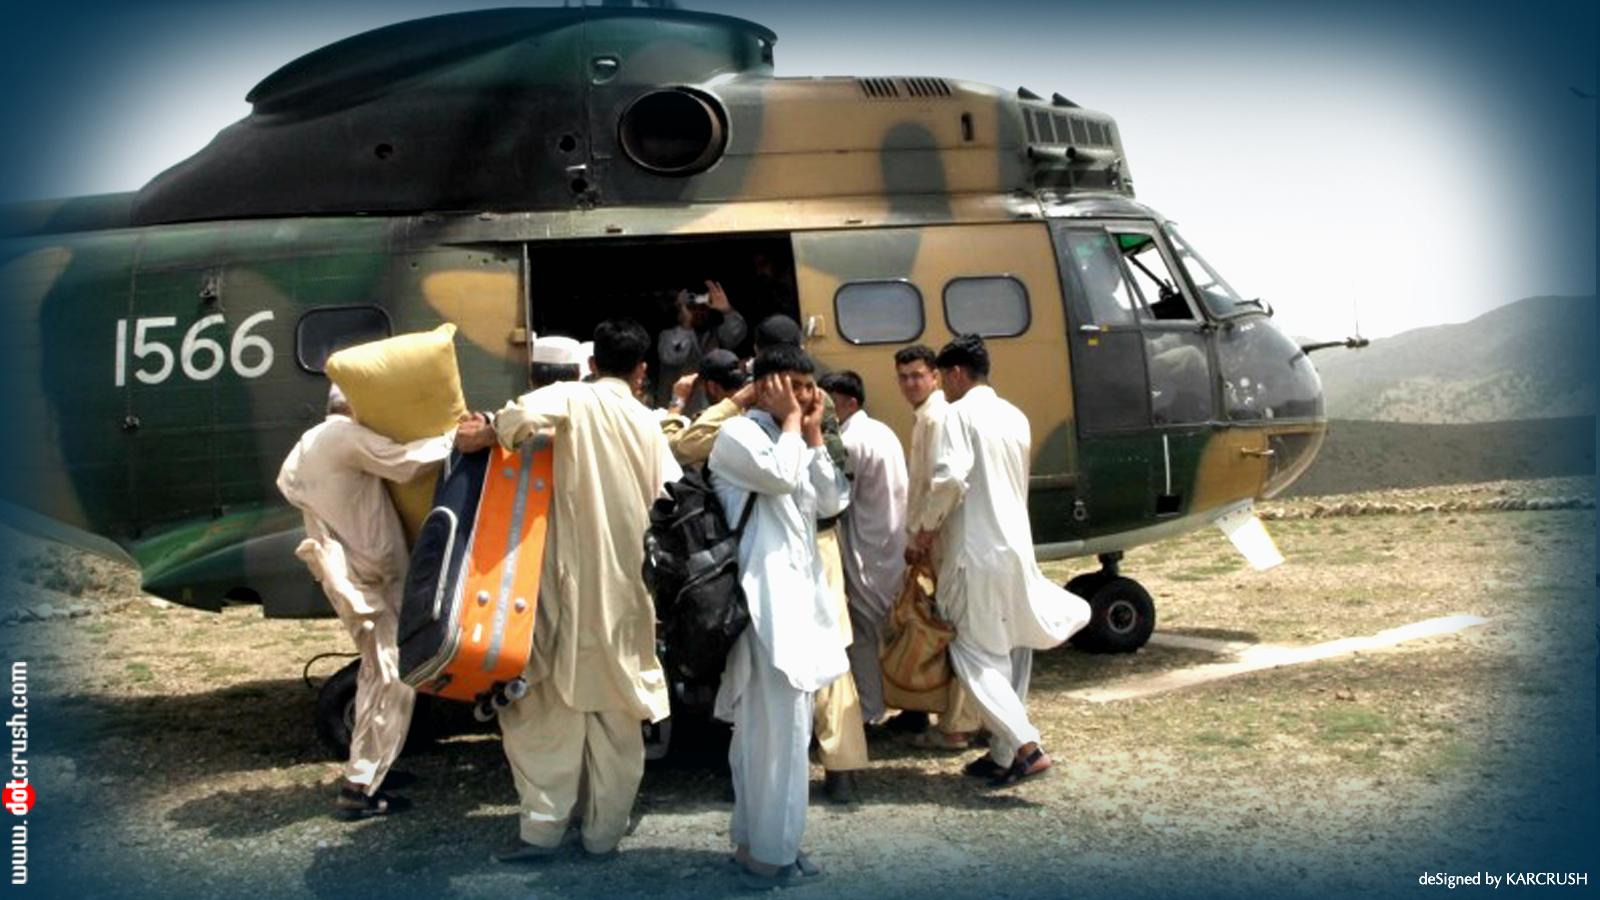 http://2.bp.blogspot.com/-X6KgoQcmryU/Thh-yZKwdVI/AAAAAAAAAc4/K0lQJtLCej8/s1600/mtt-pakistan-army-helicopter-rescuing-people-from-swat.jpg